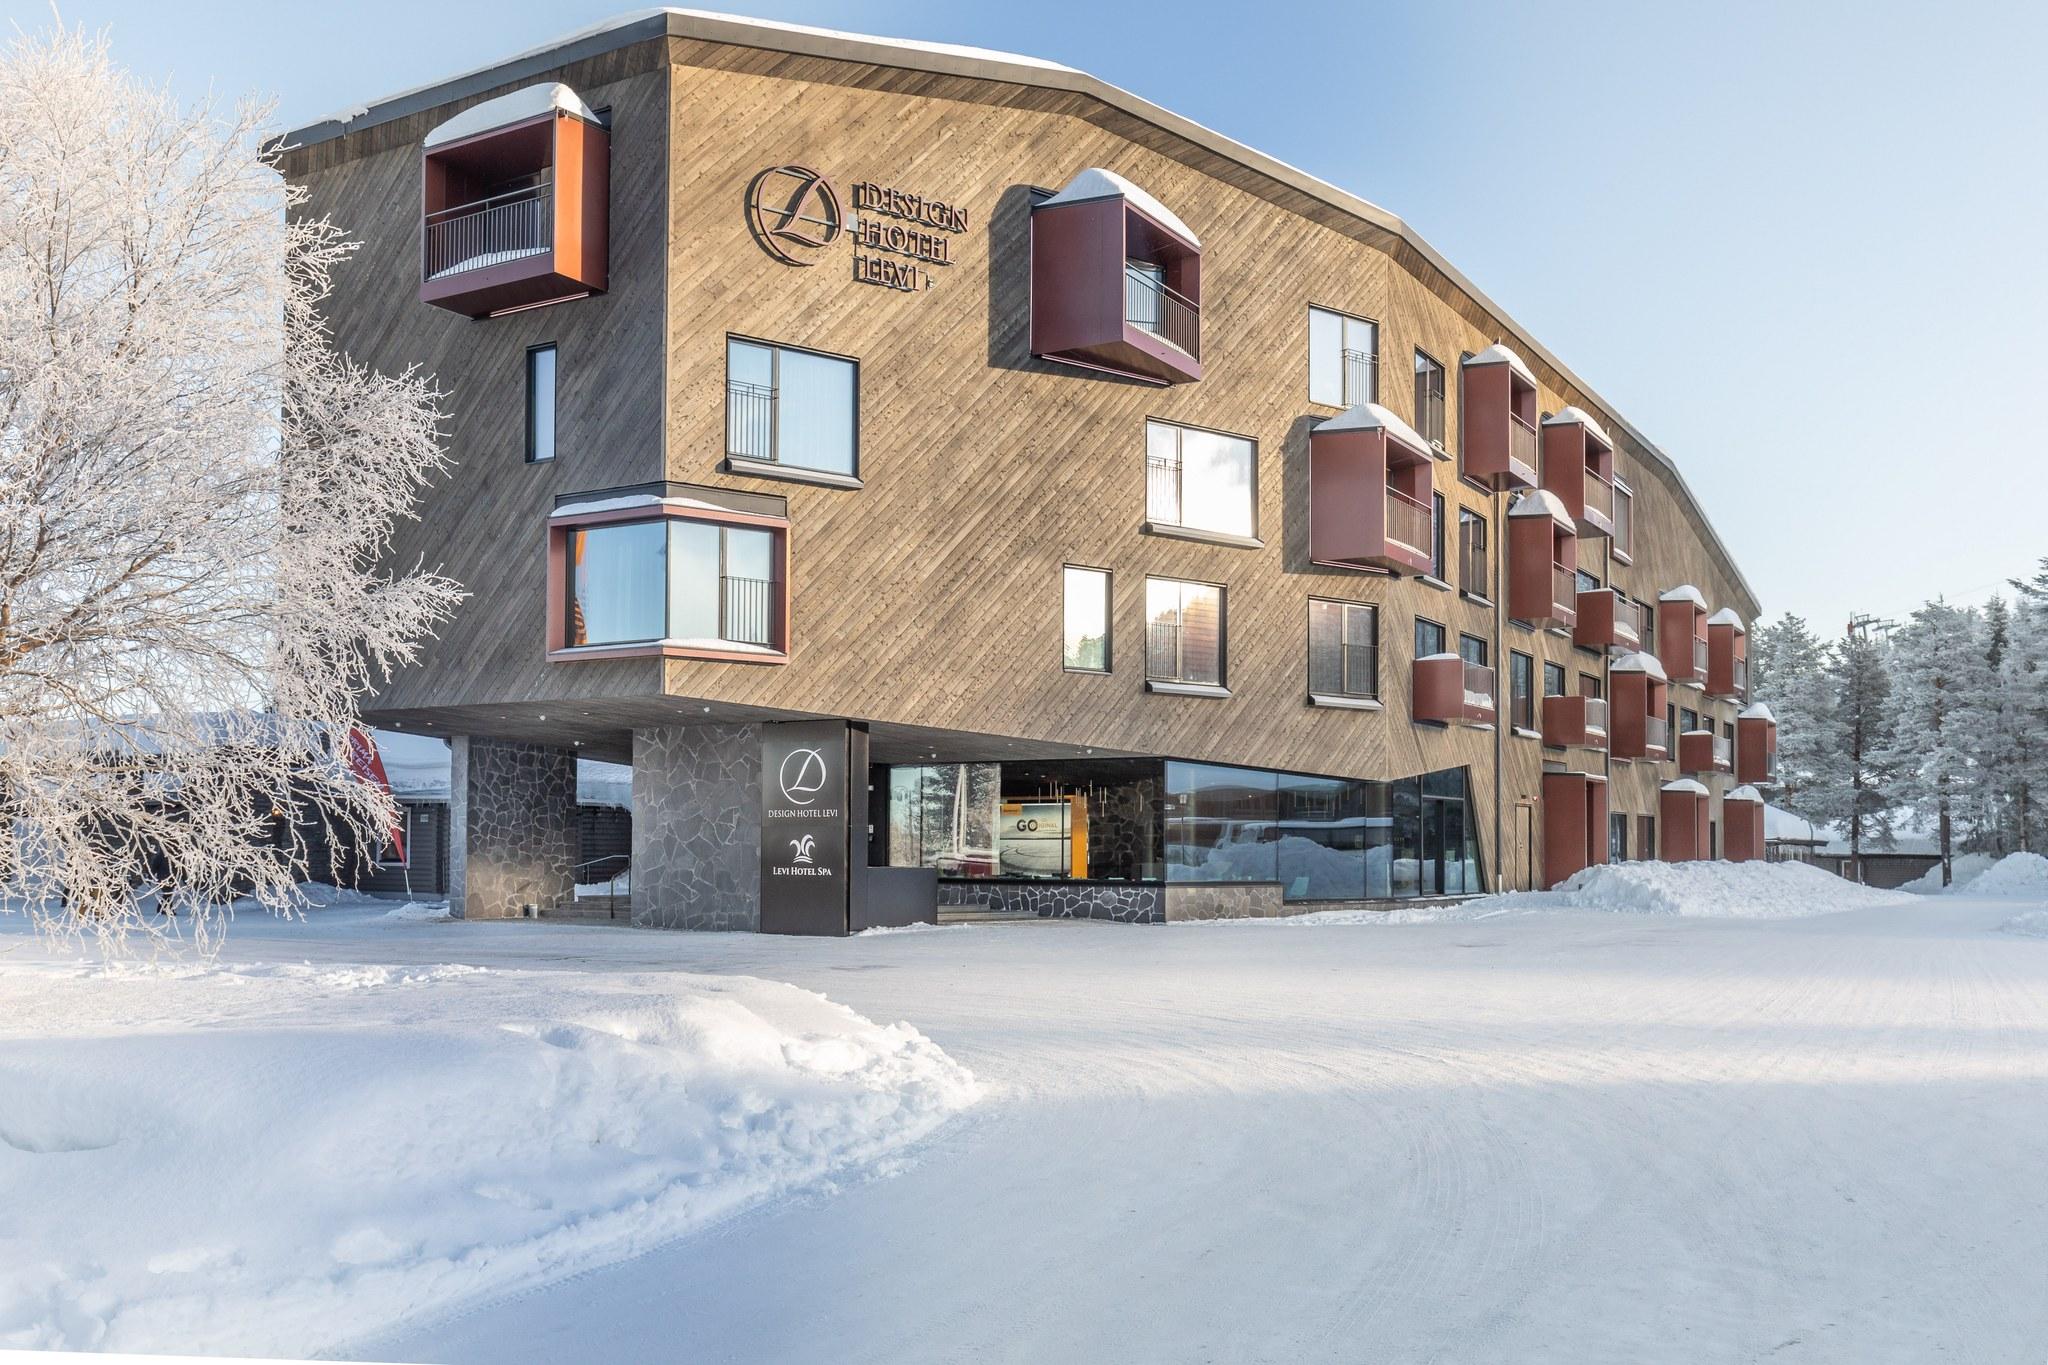 Design Hotel Levi 4 - Arno De La Chapelle